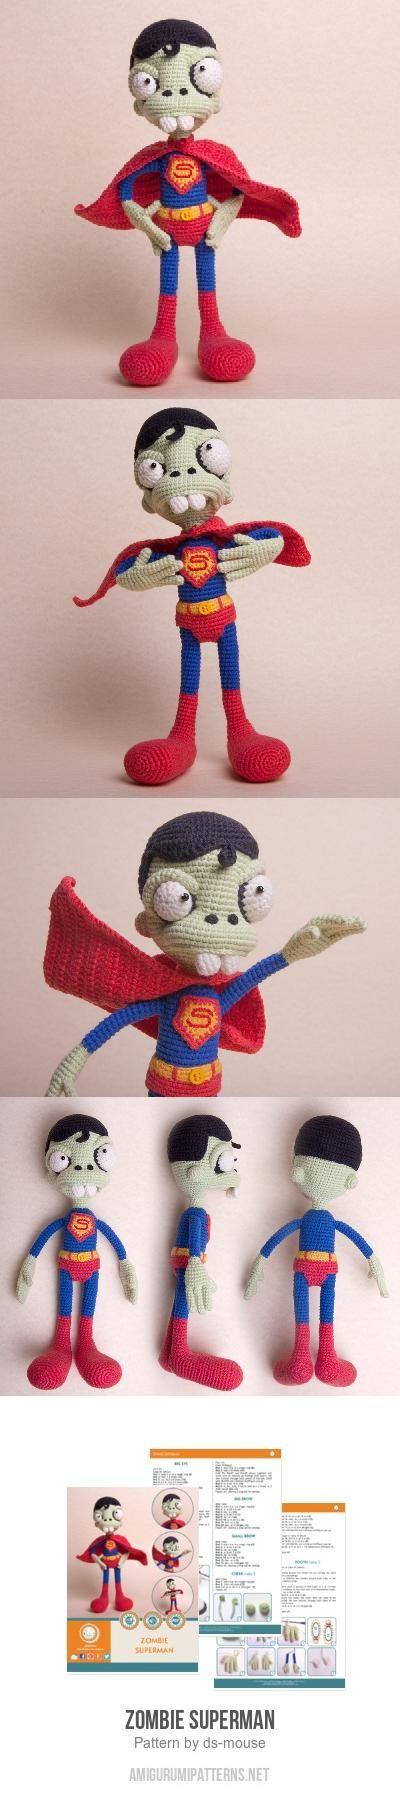 Zombie Superman amigurumi pattern by Ds_mouse | Kuscheltiere häkeln ...